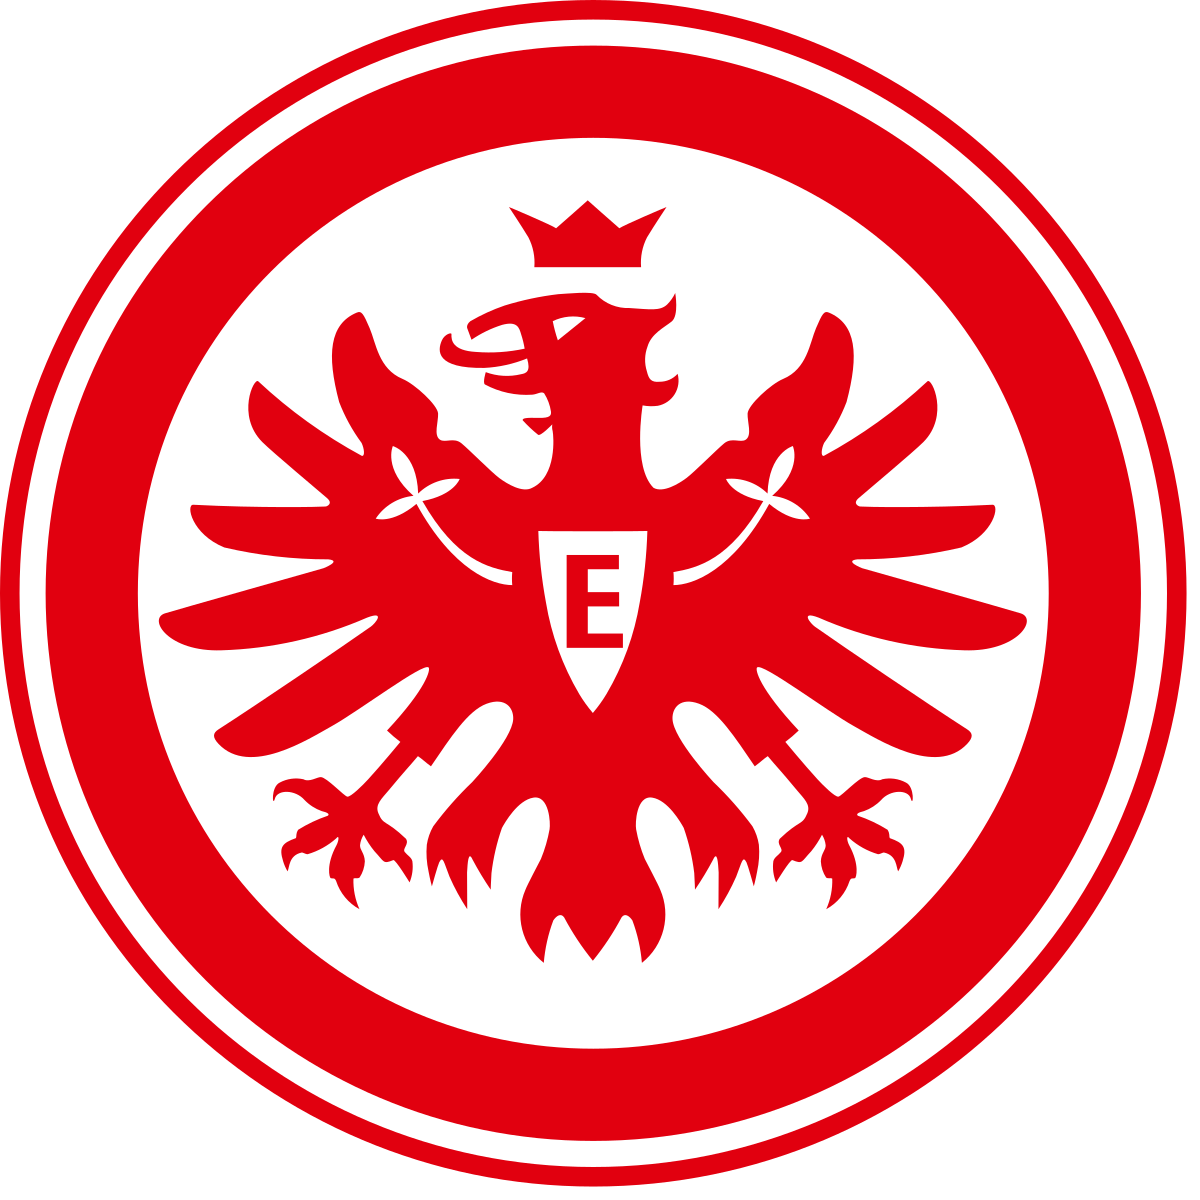 Eintracht frankfurt clipart